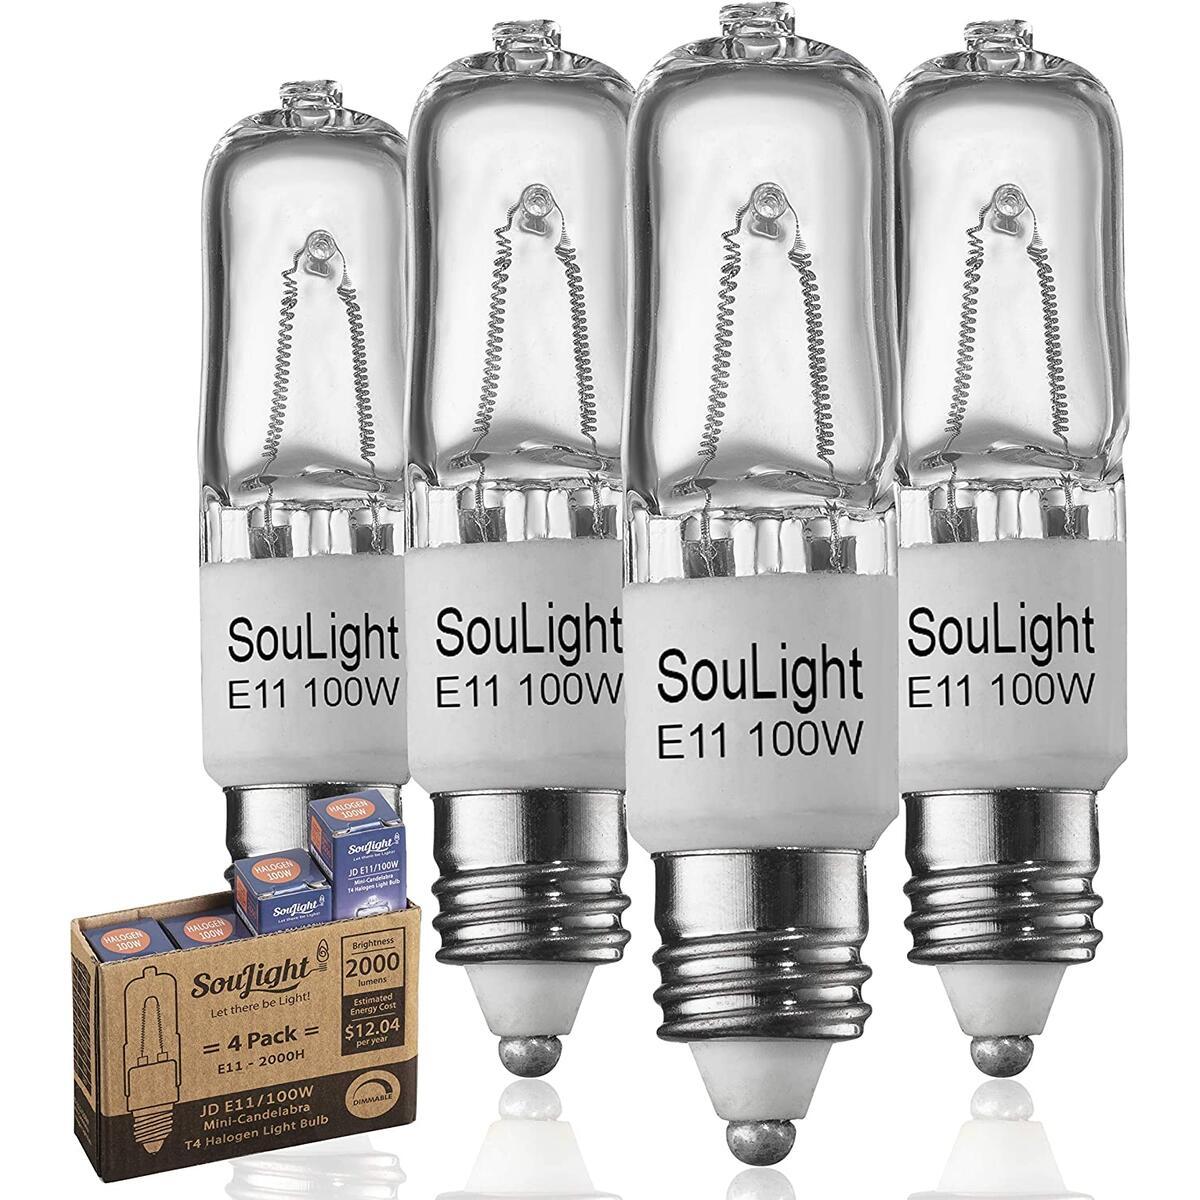 Halogen JDE11 120v 100W - Feit T4 E11 Mini-Candelabra Base Light Bulb - Warm White 2800K - Dimmable - Replacement Bulbs for Ceiling Fans, Chandeliers, Cabinet Lighting & More- 4 Pack